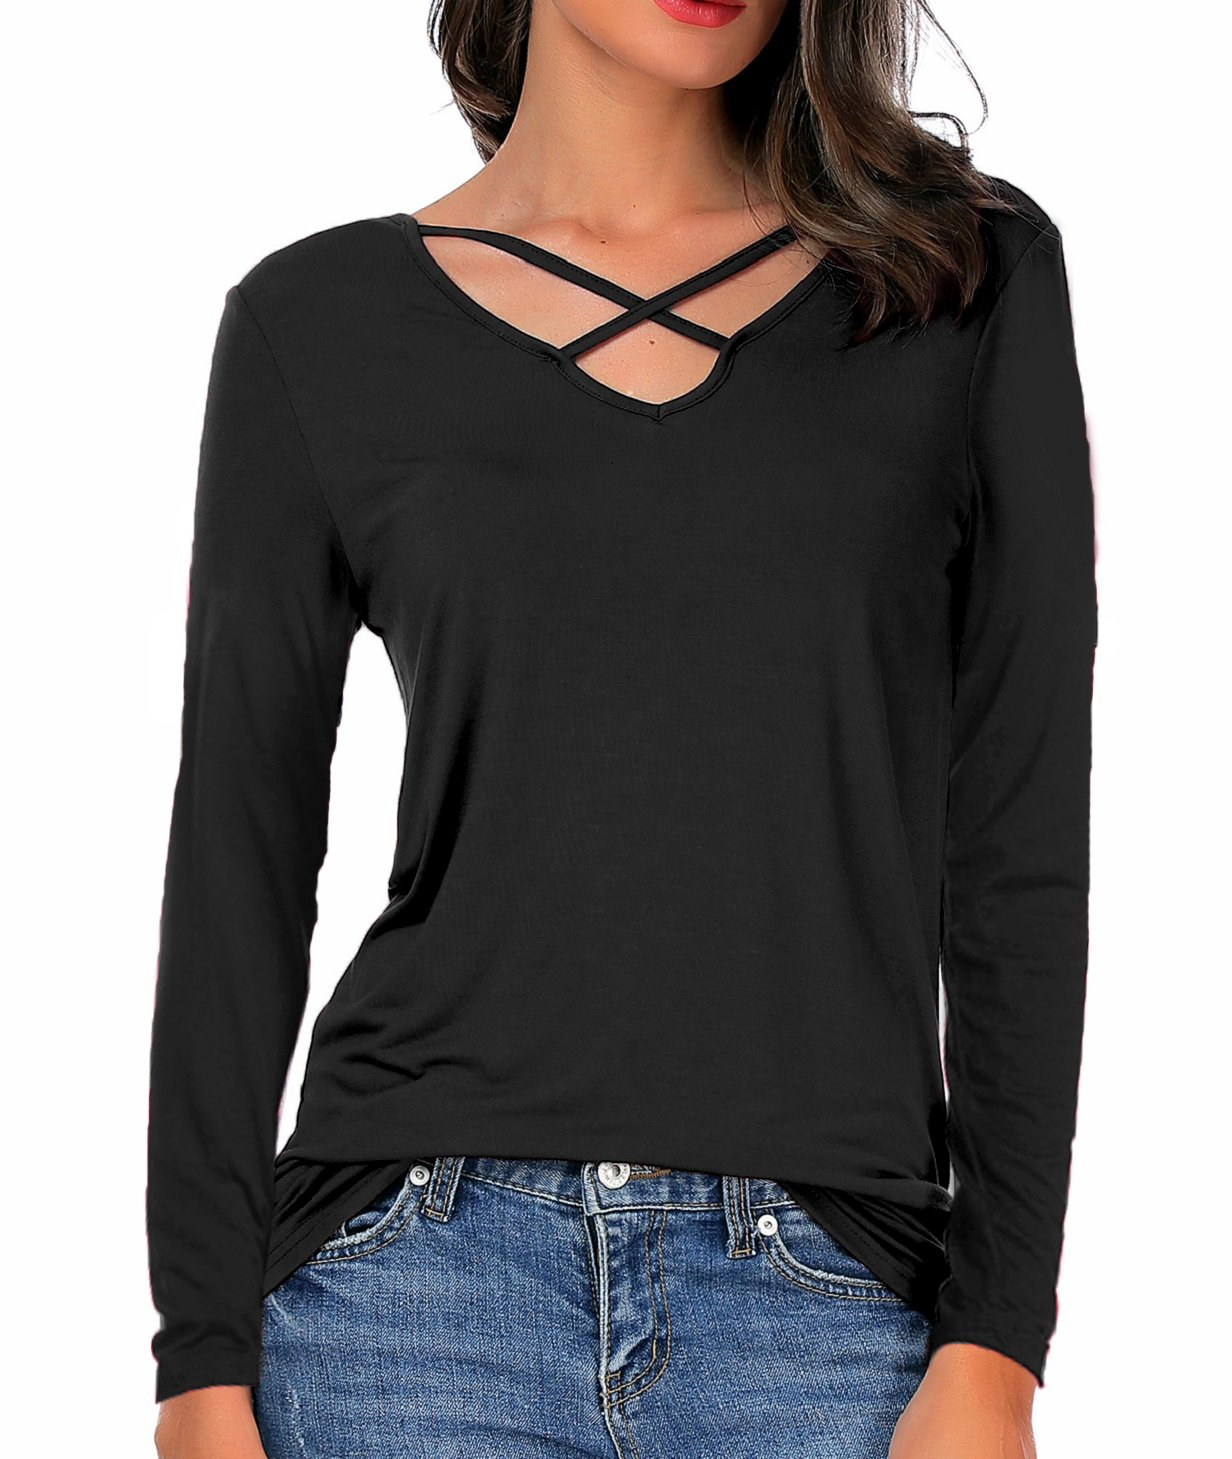 CPOKRTWSO Women Summer Tops Cross Front Deep V-Neck Long Sleeve Tees Top,Long-black,Large